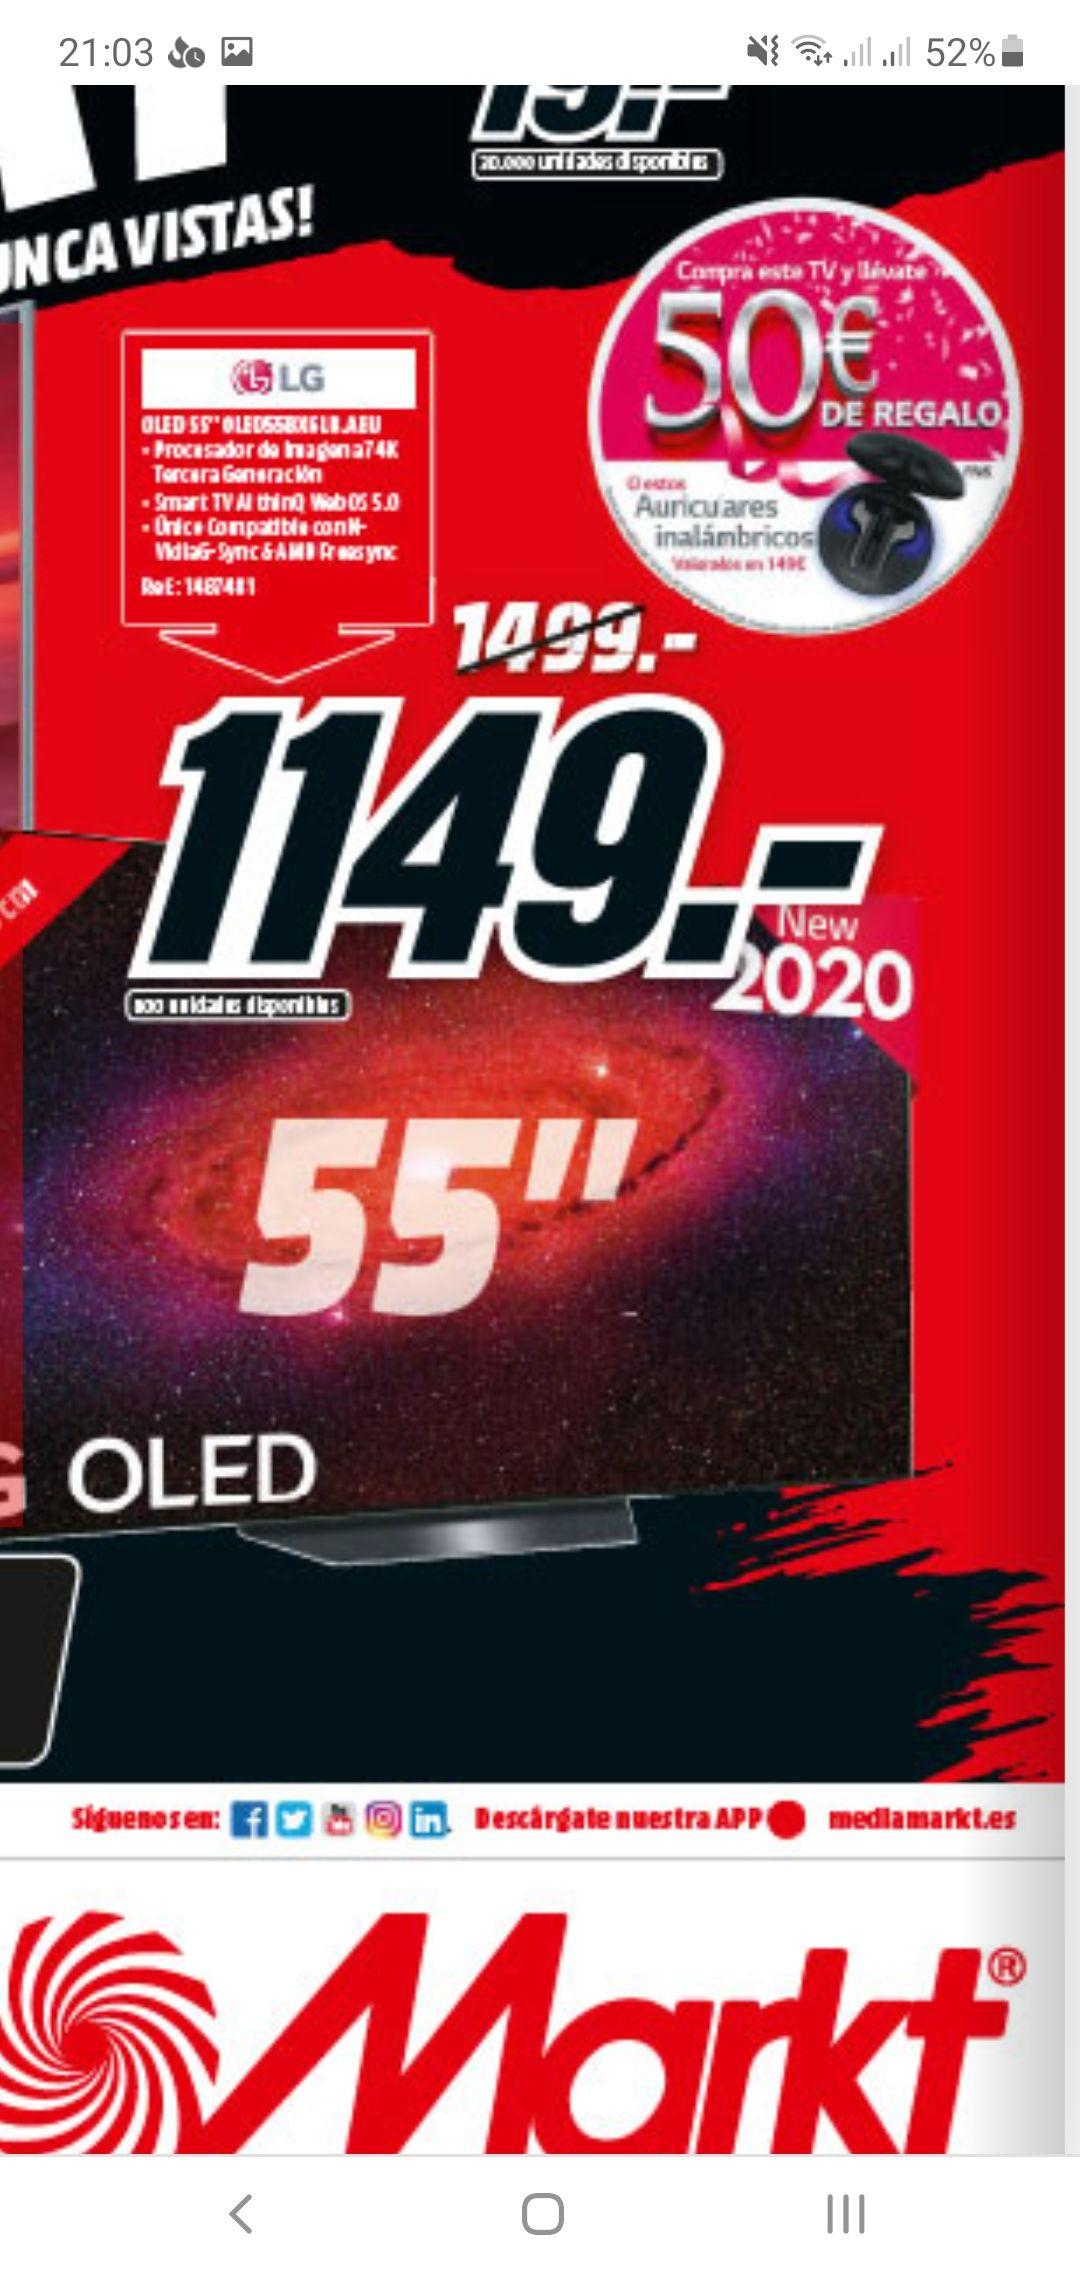 OLED55BX6 LG con reembolso de 50€